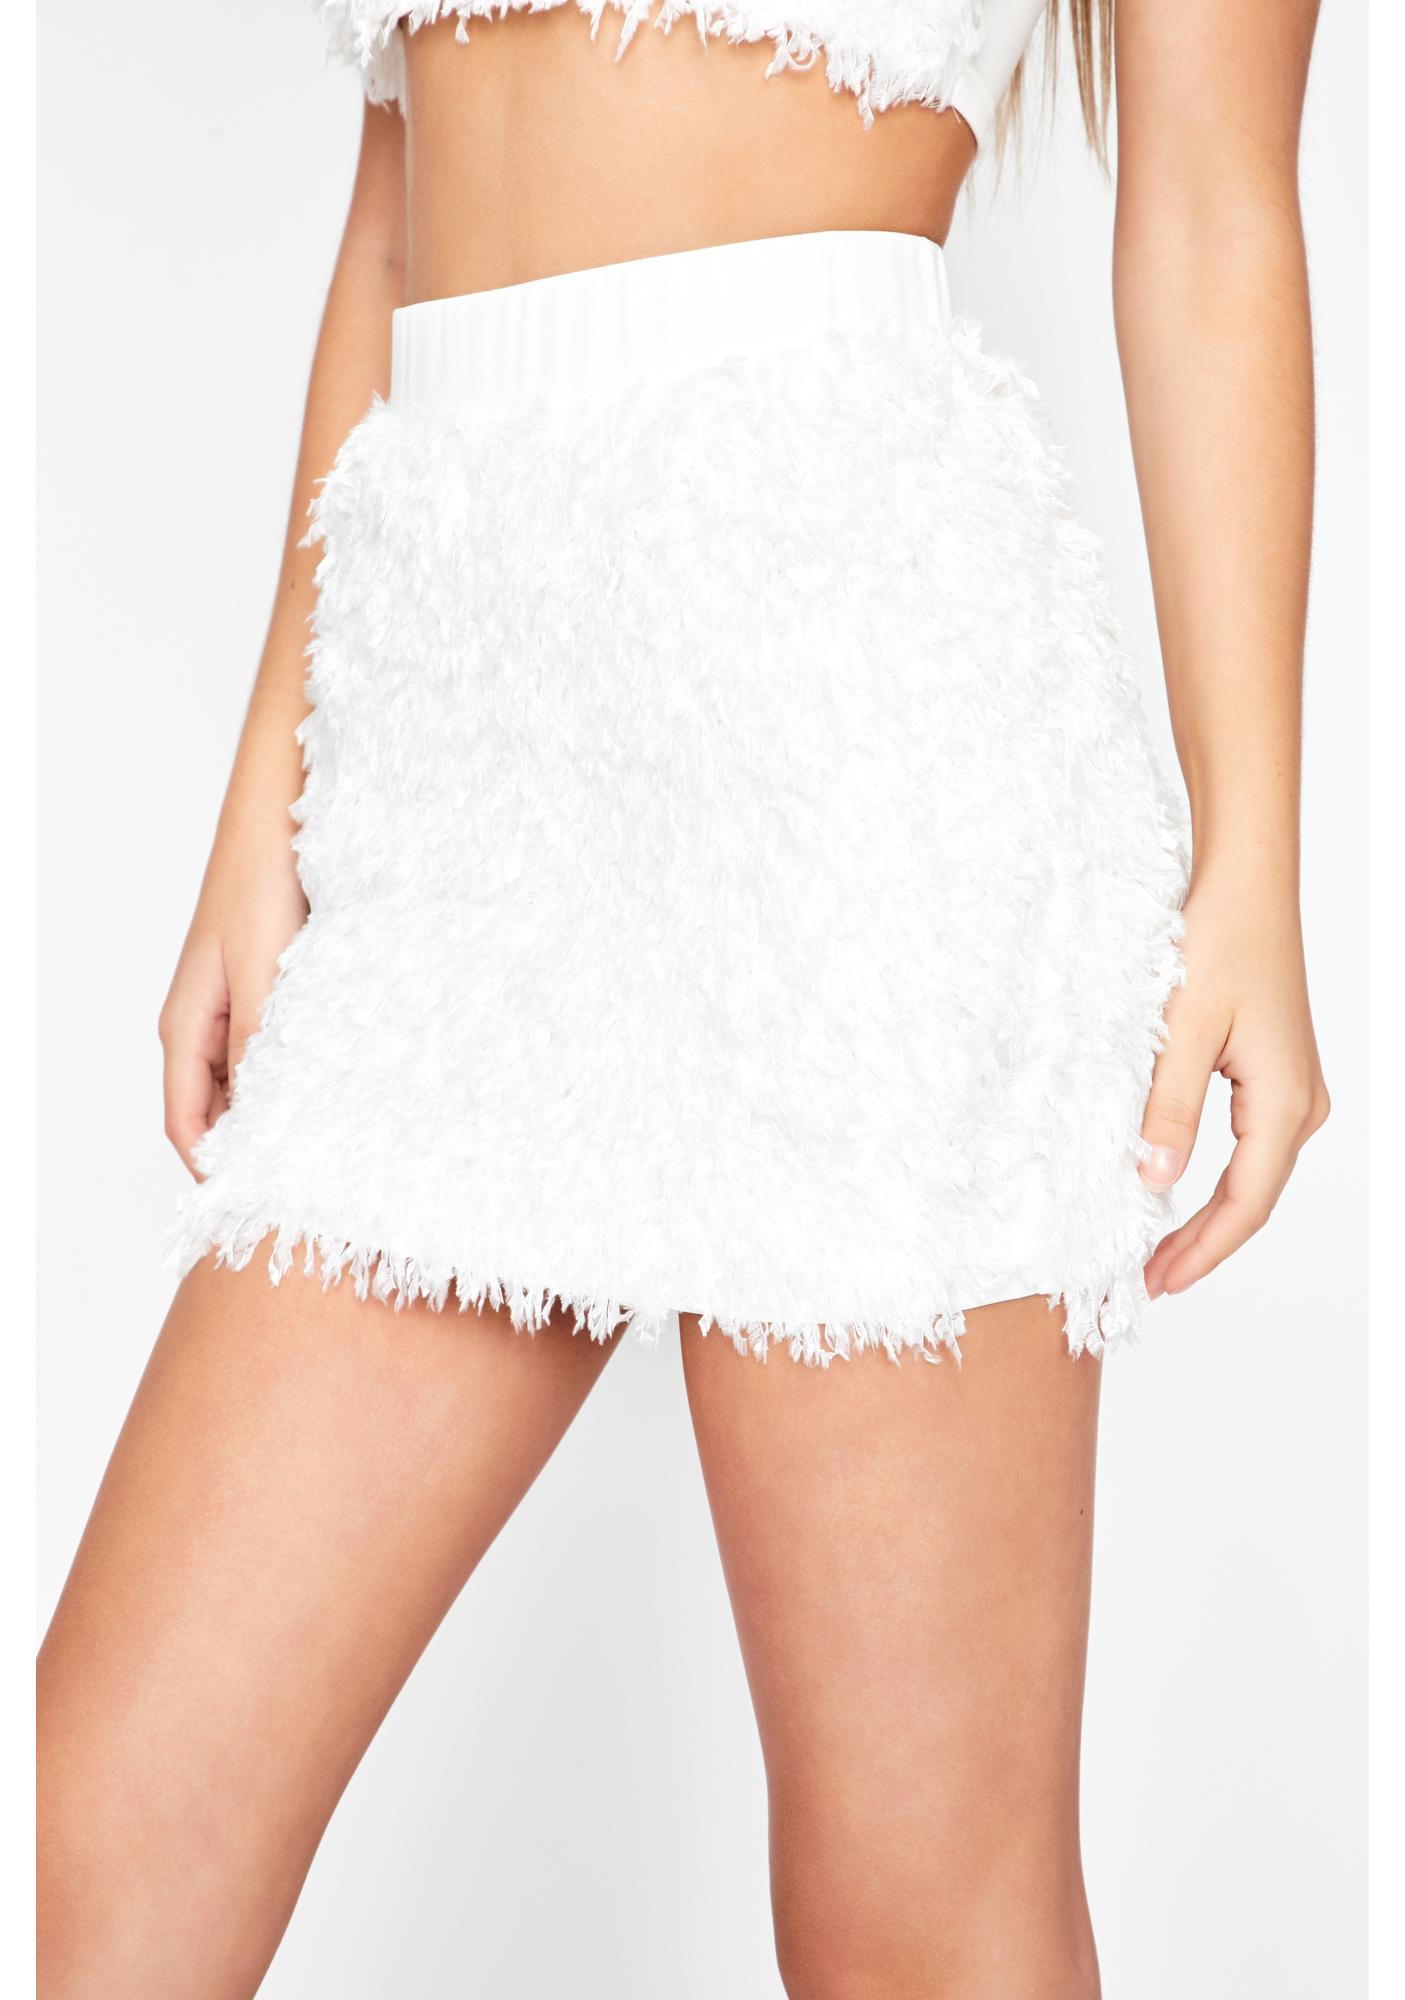 This Feeling Fuzzy Skirt